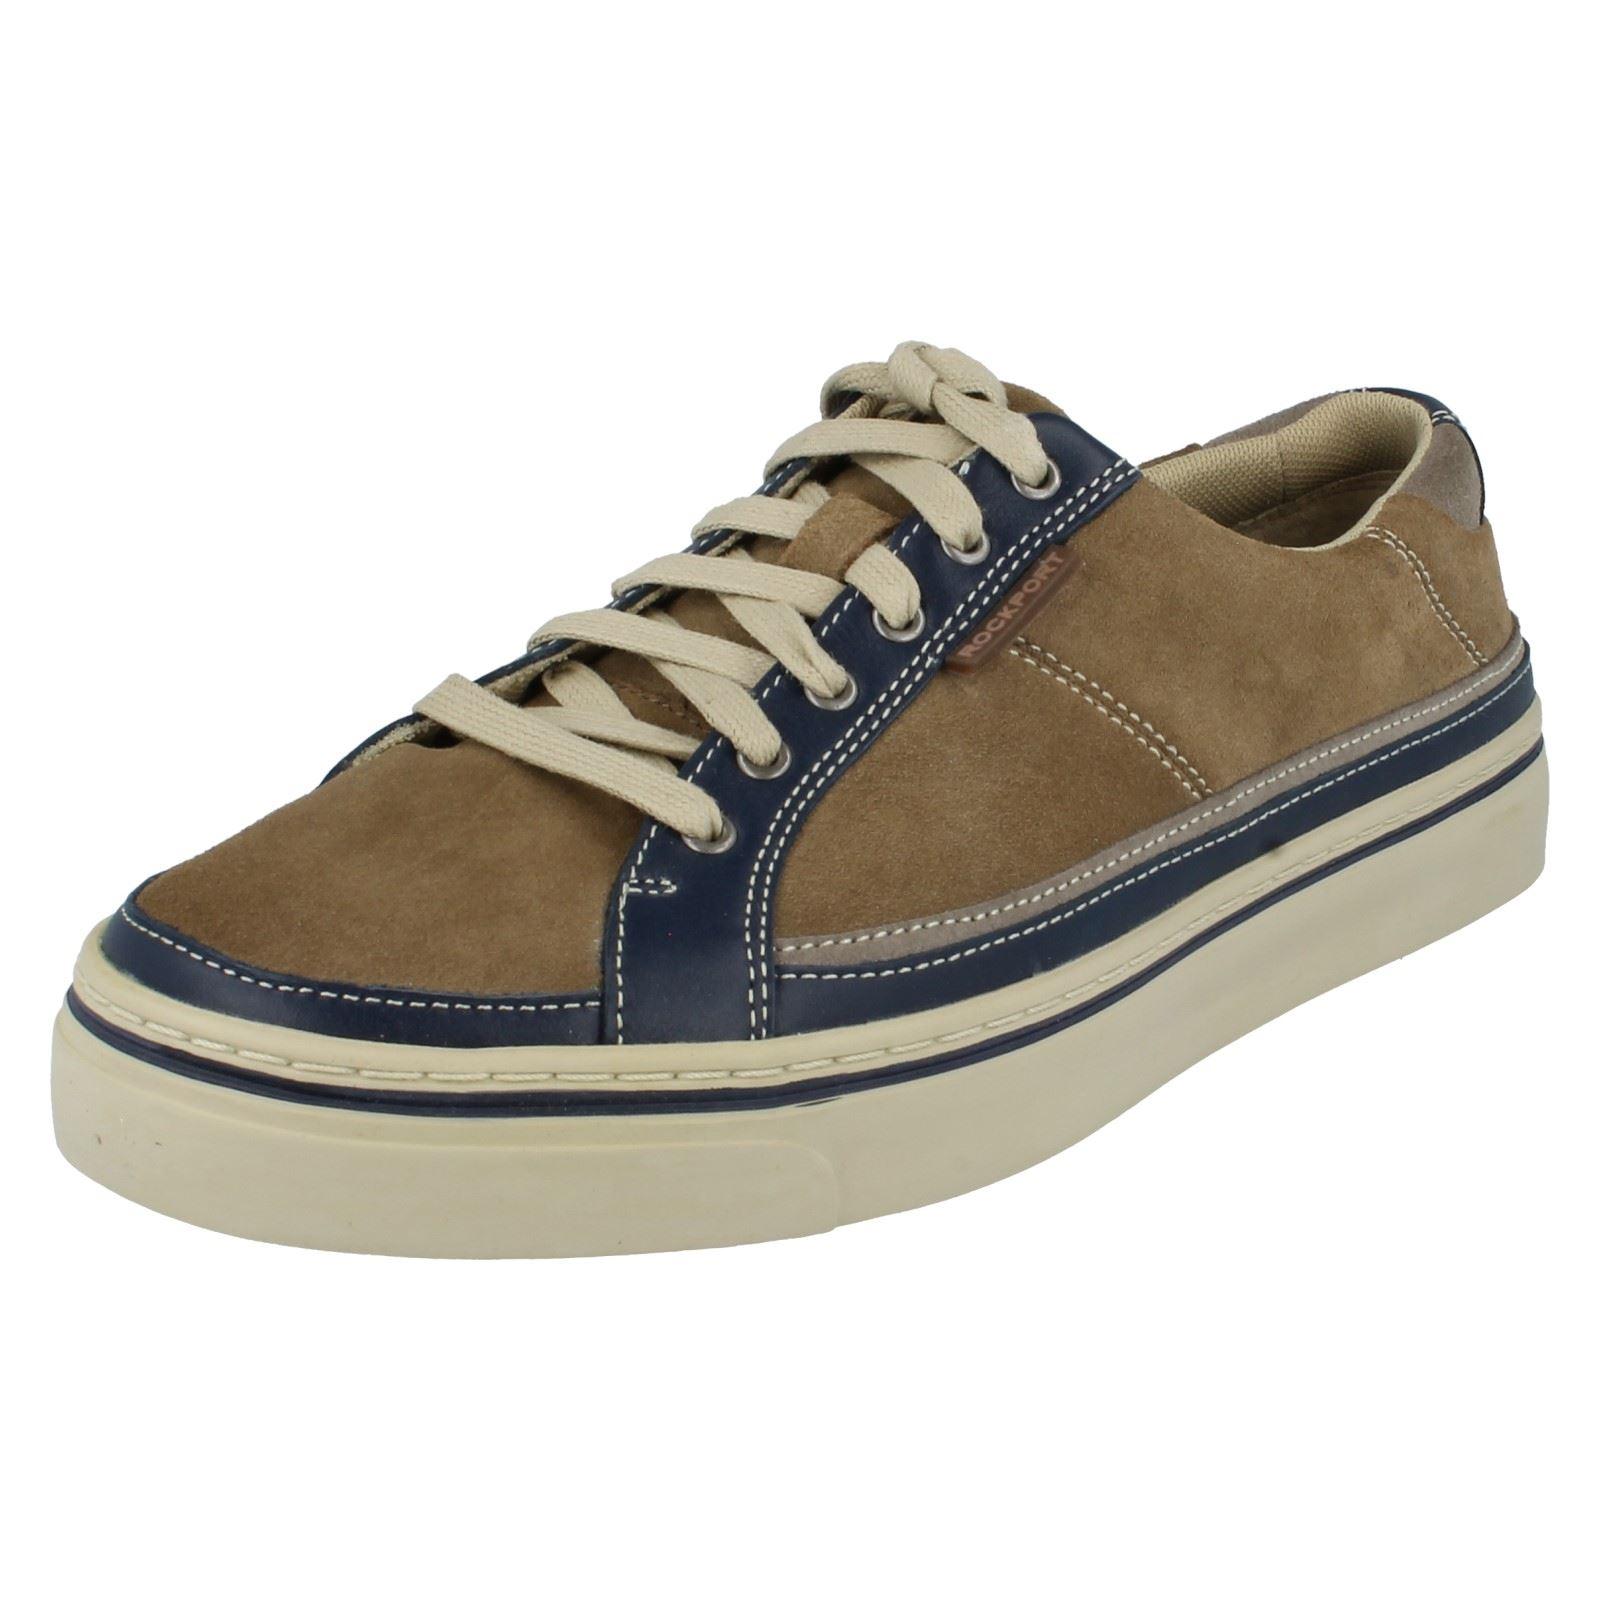 mens rockport casual shoes trevion apm2740w ebay